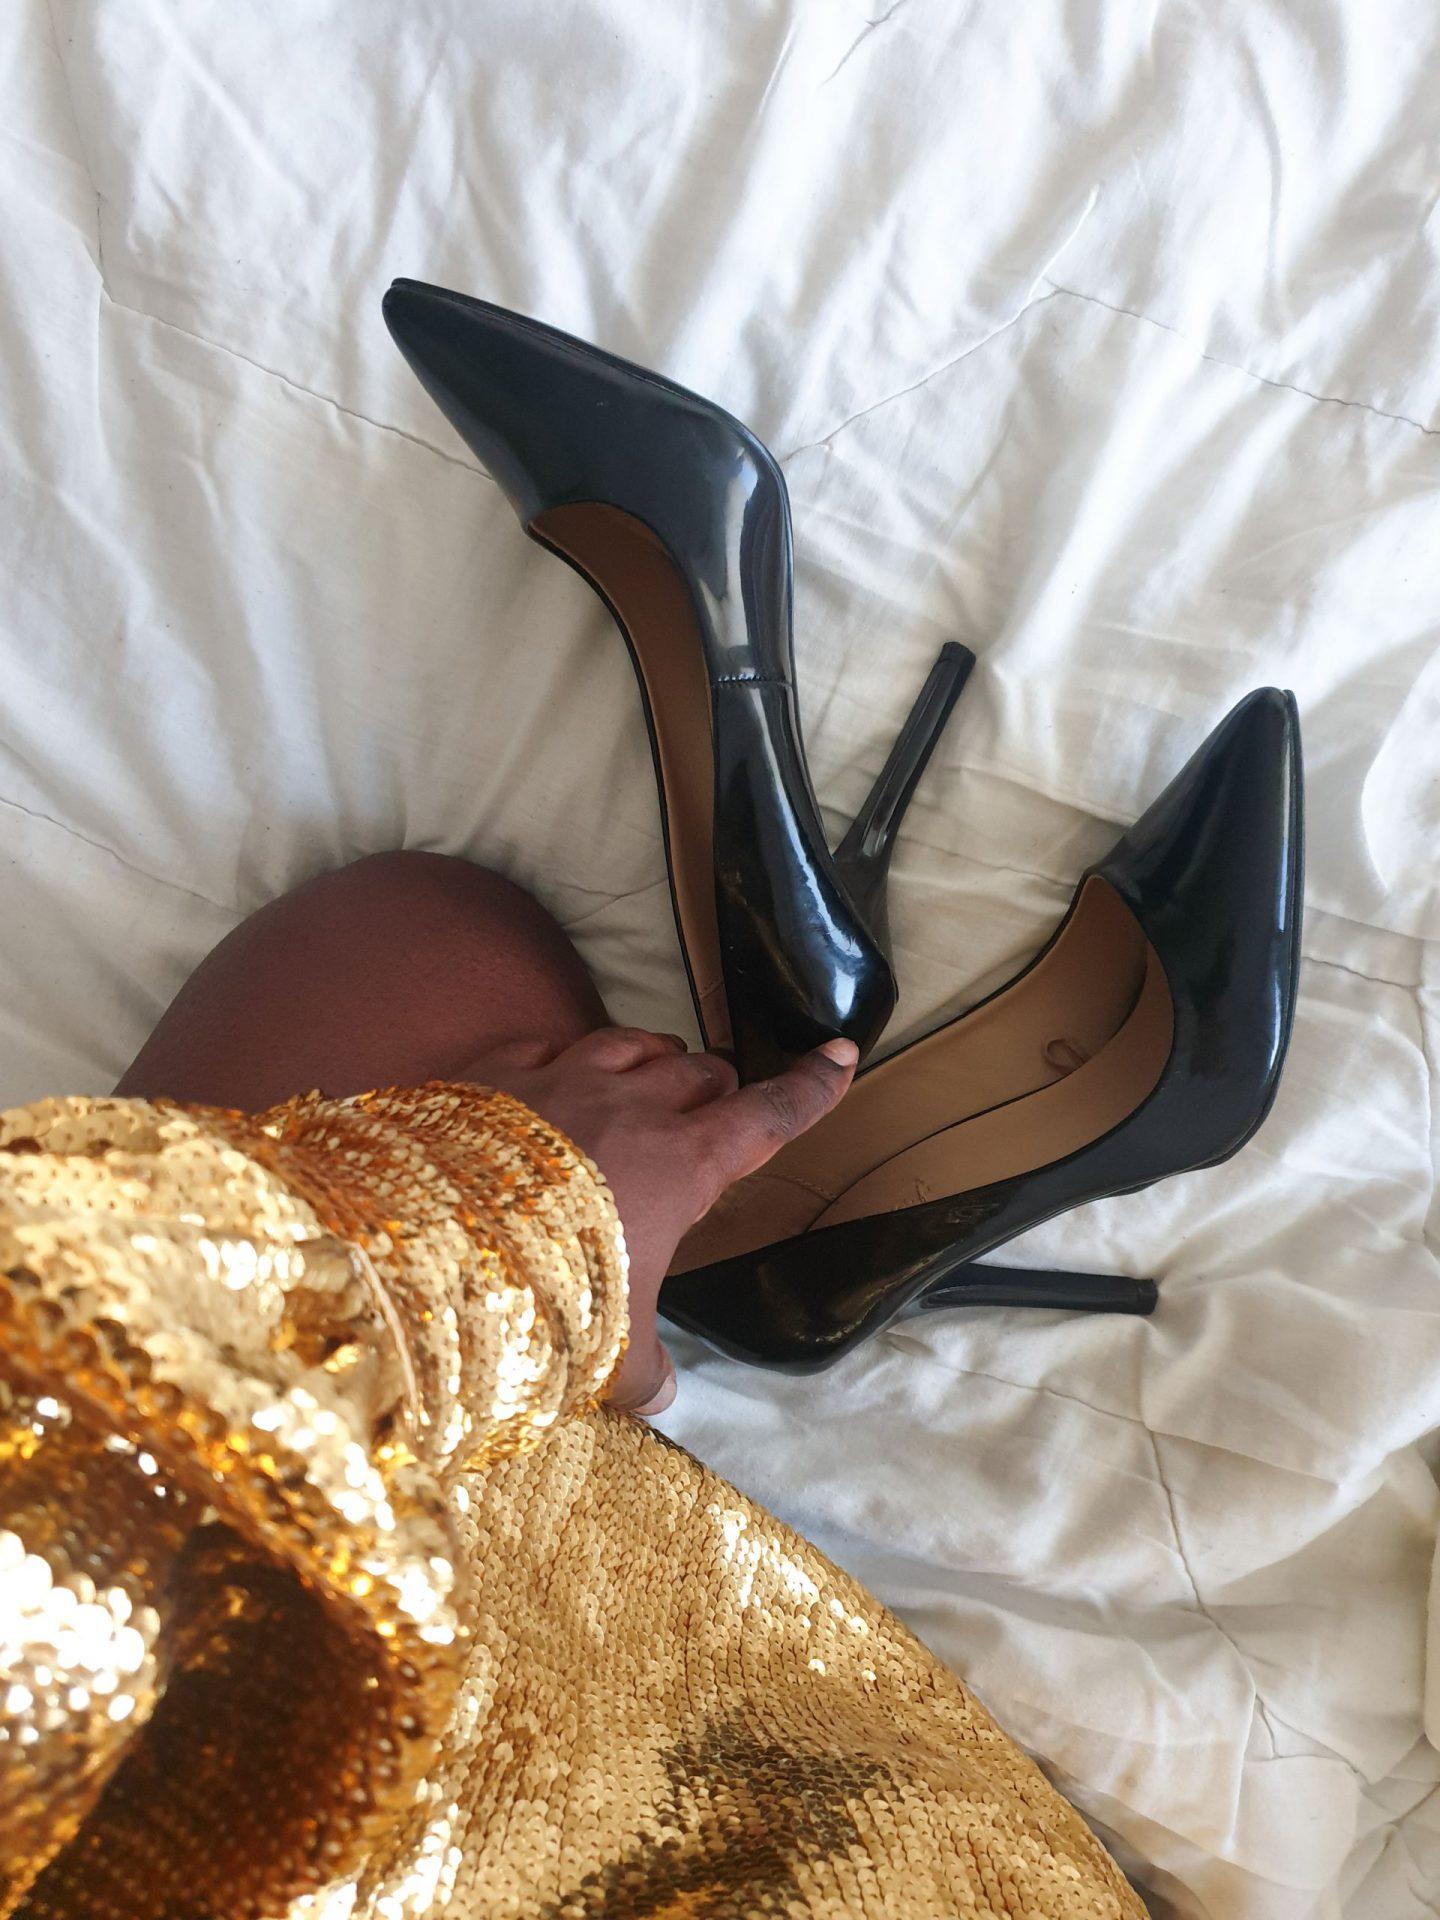 sequin dress and black high heels